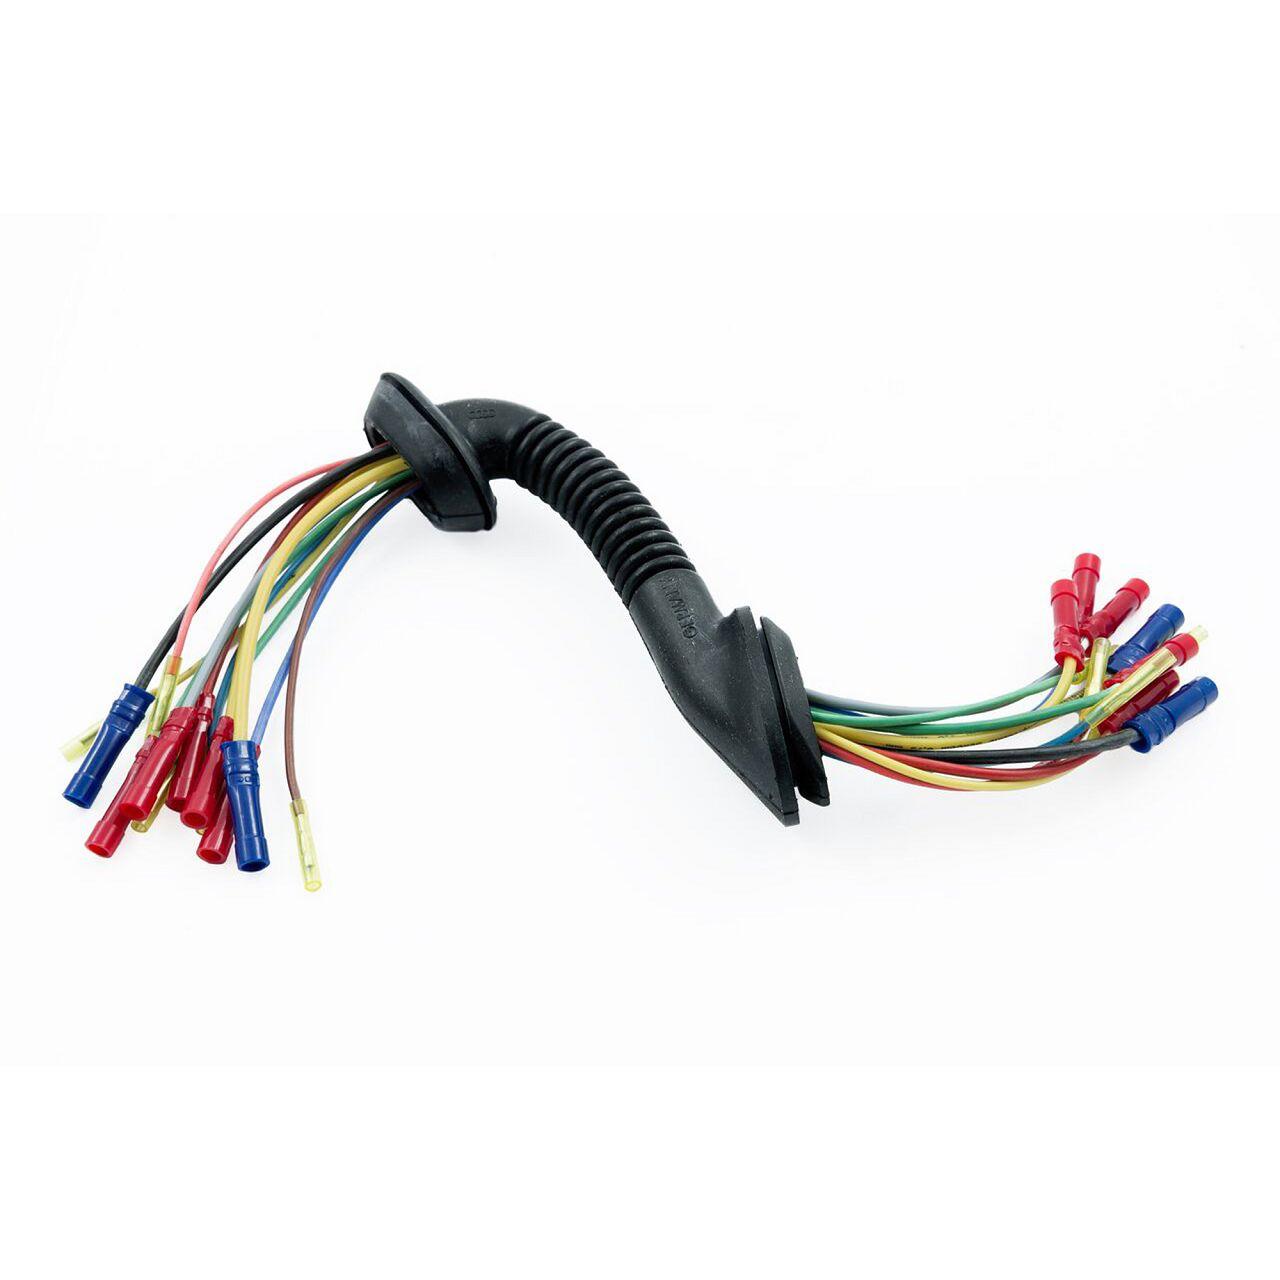 Kabelbaum Kabelsatz Kofferraum Heckklappe für AUDI 100 (4A C4) AVANT 12-polig